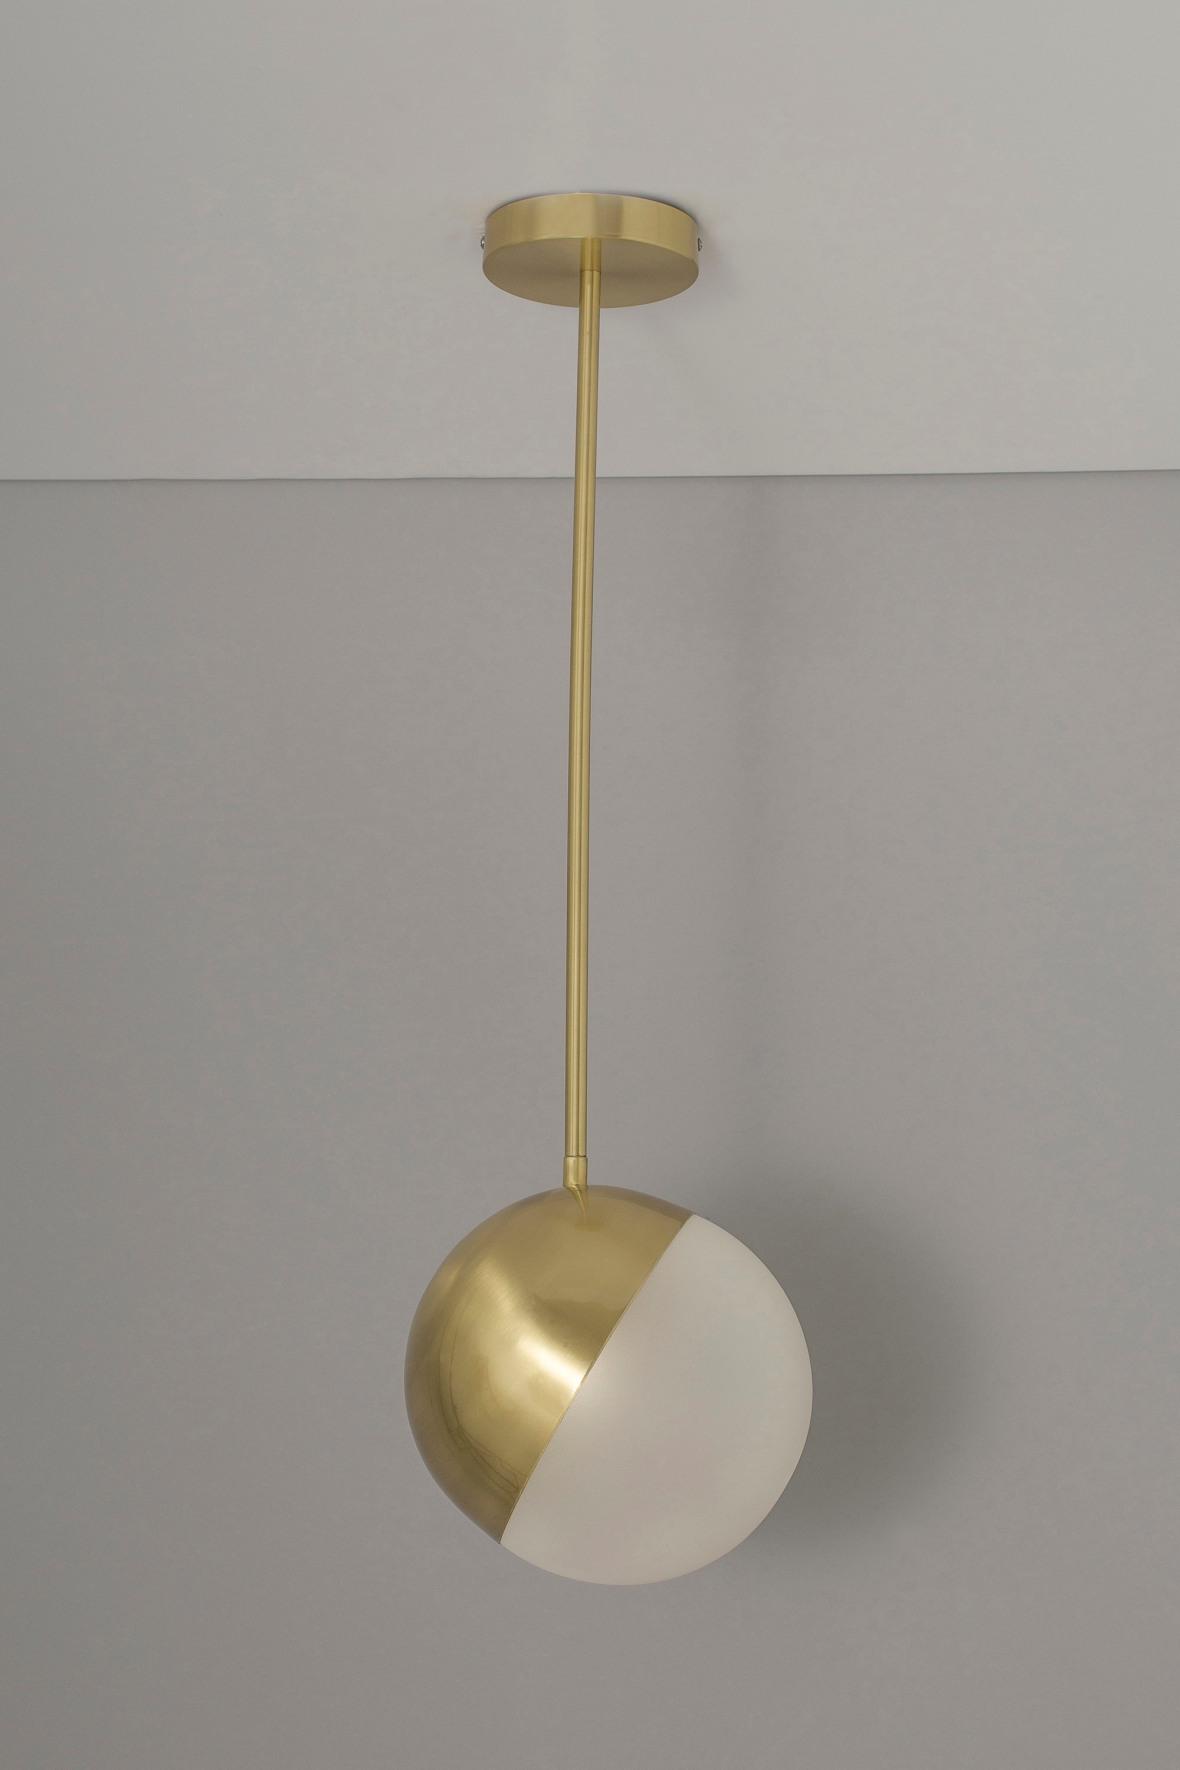 30002368-01-Kolding-ball-pendant